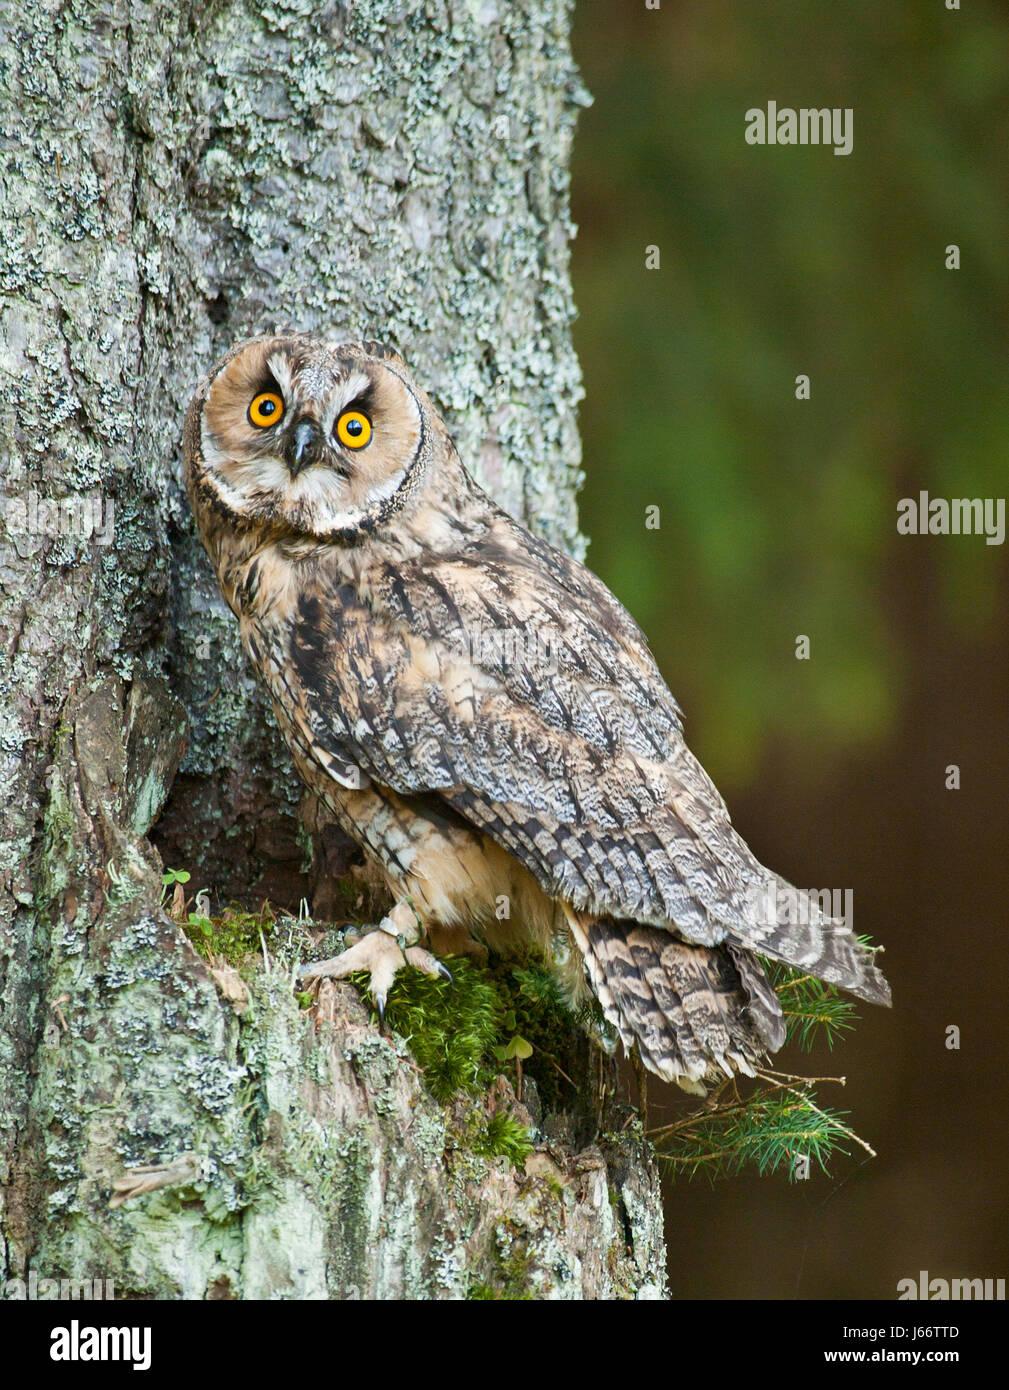 Standortwahl auf dem Baum - Asio Otus Otus Waldohreule Stockbild